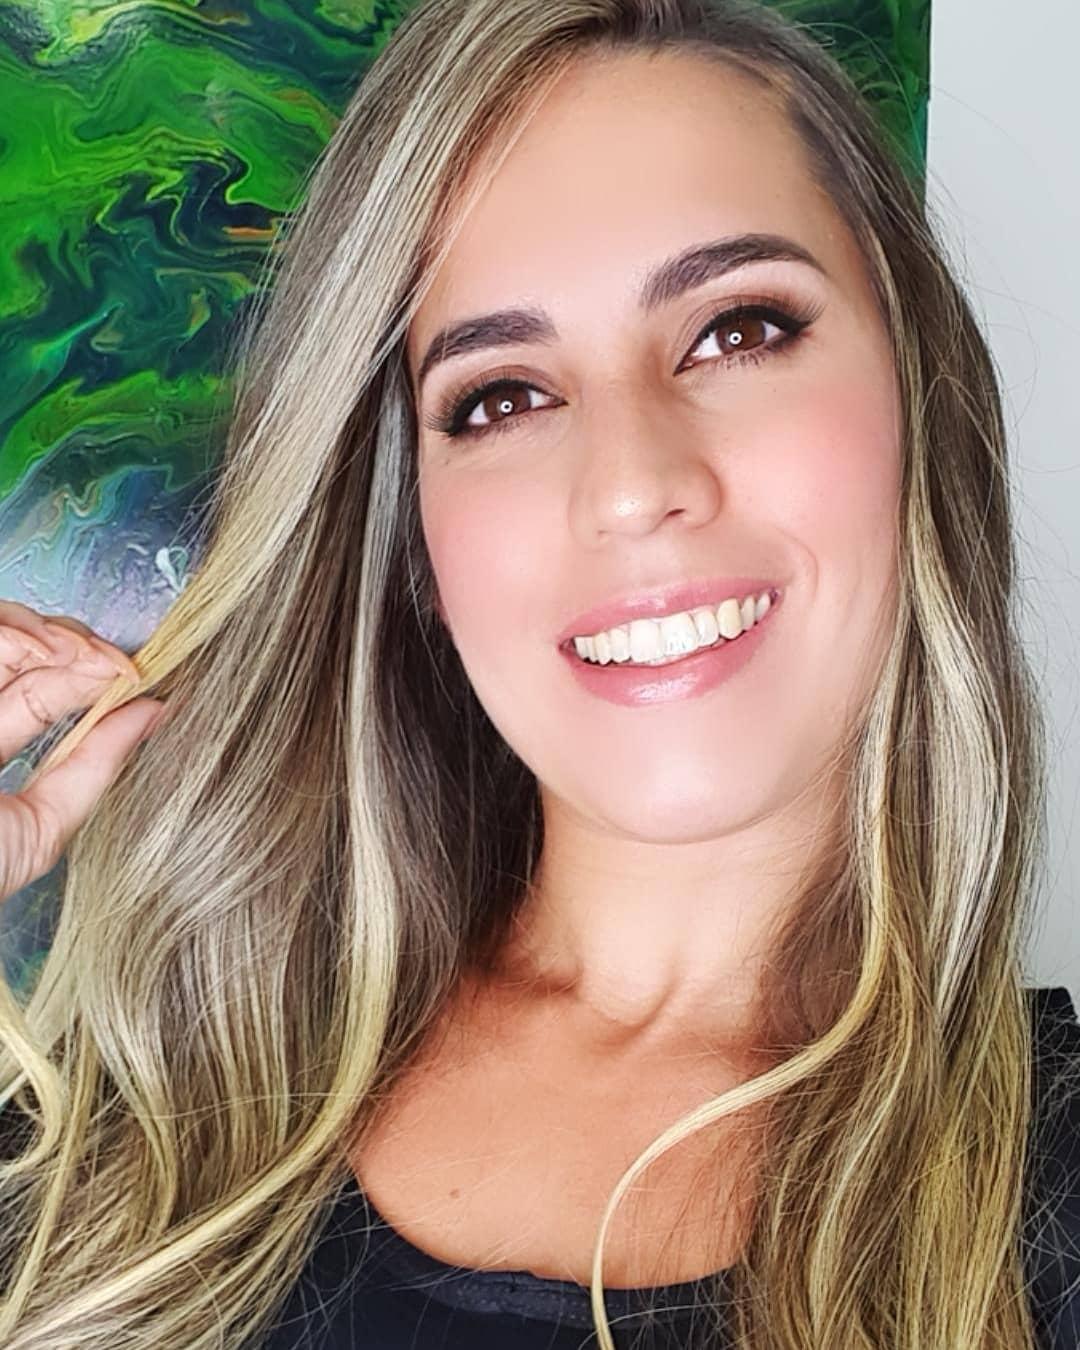 Amanda-Miguez-Wallpapers-Insta-Fit-Bio-15